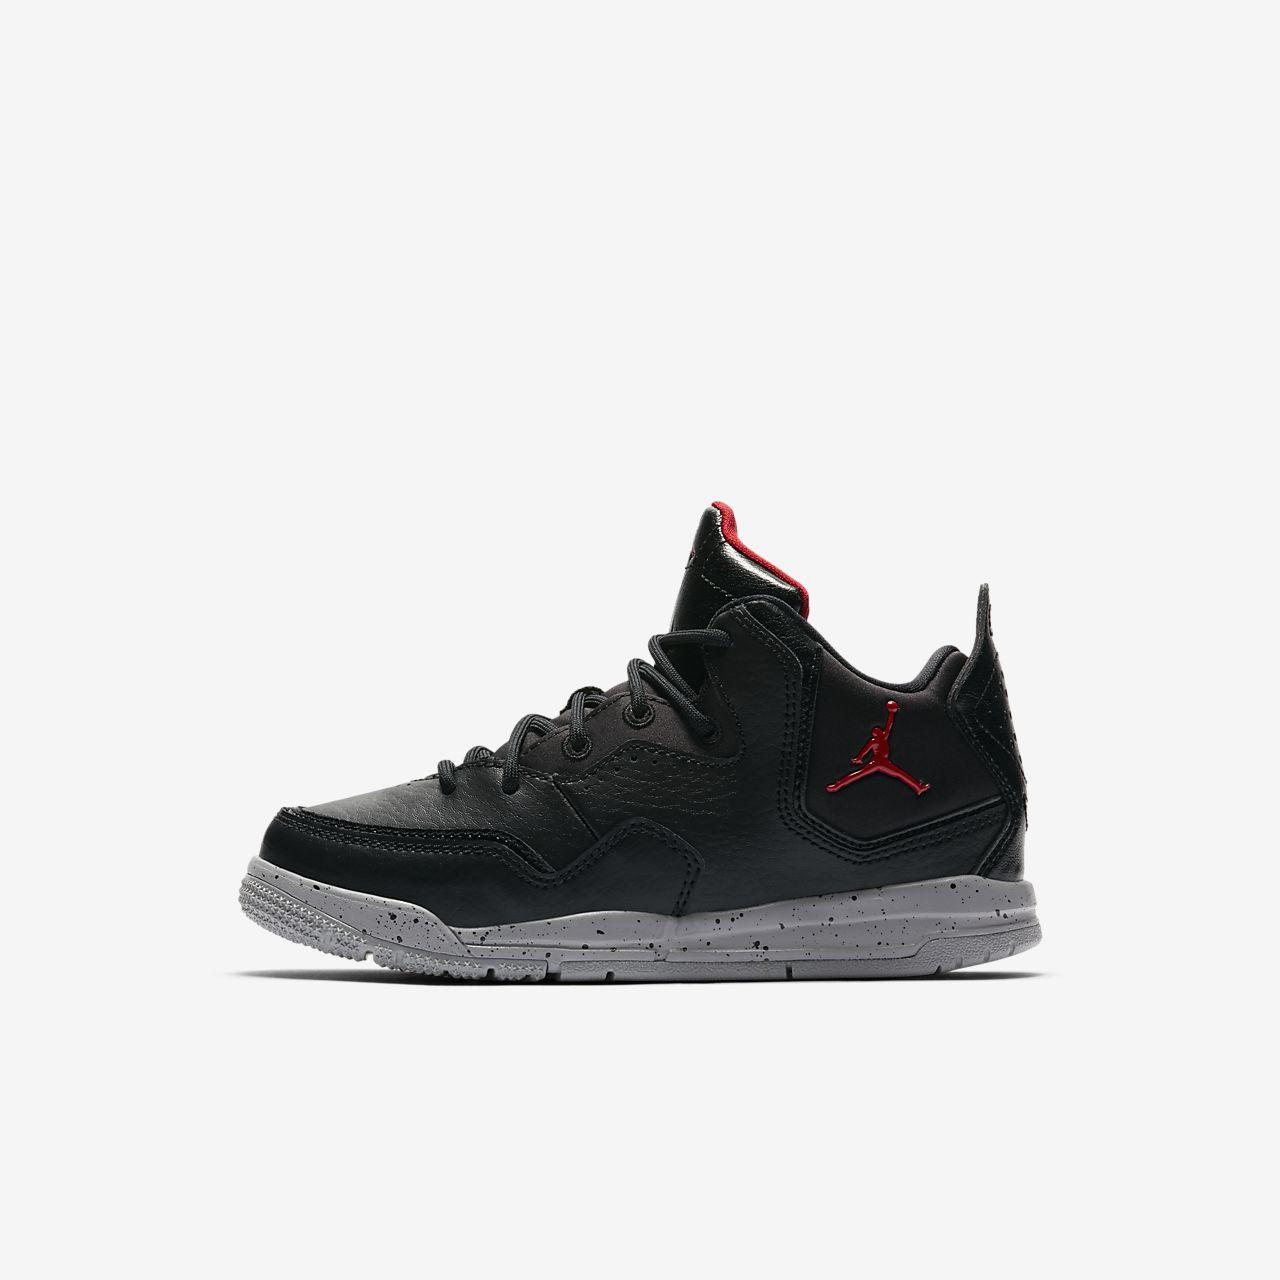 Jordan 23 Chaussures Courtside Noir uXag1RkQ